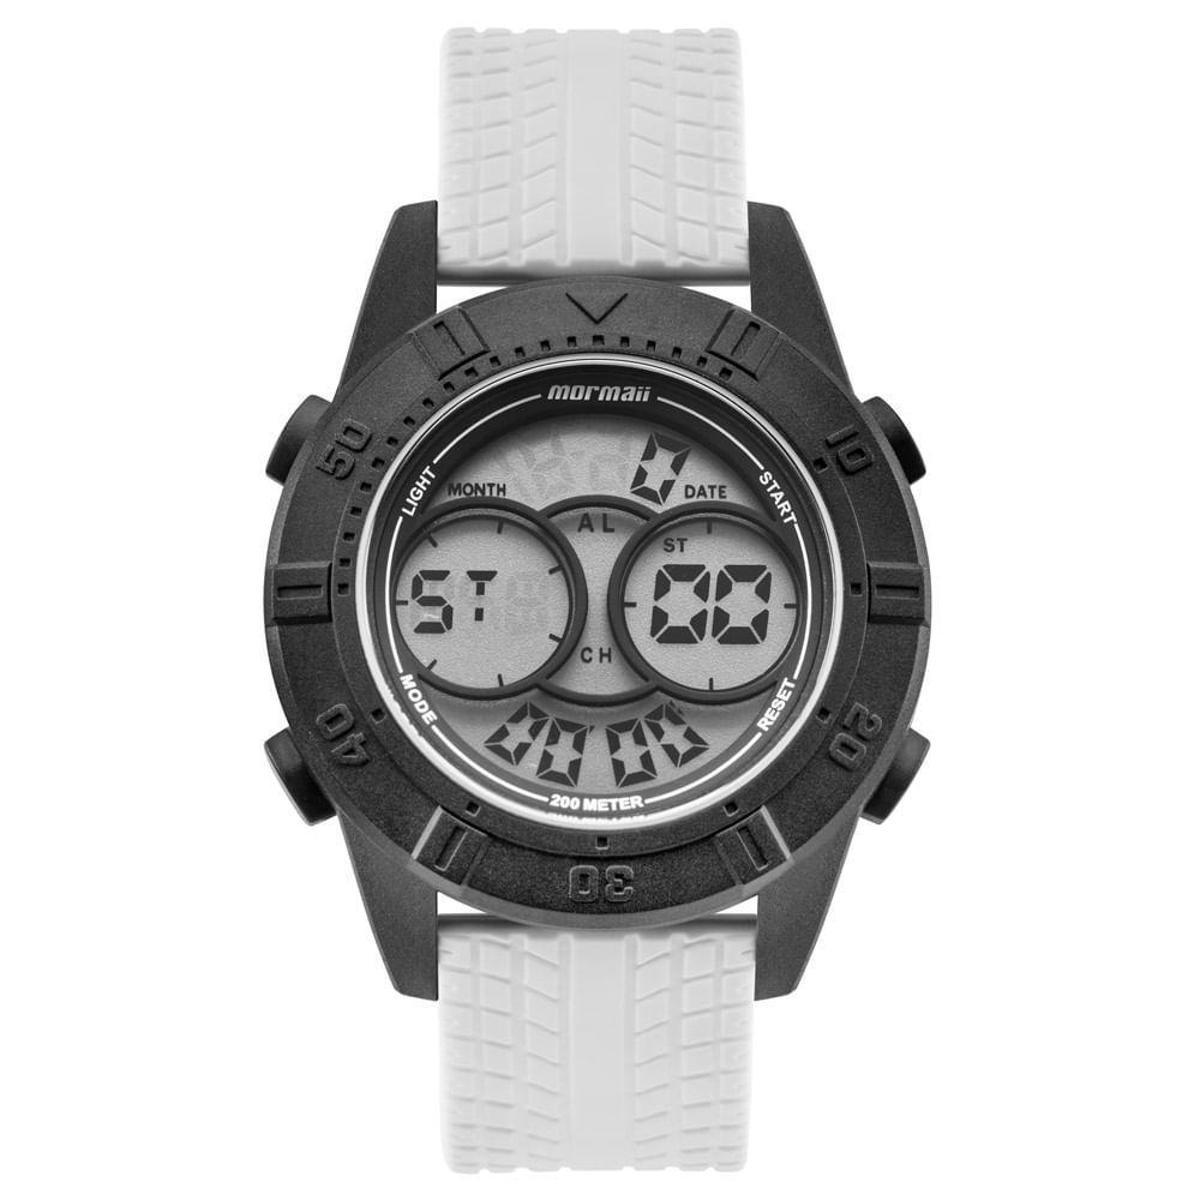 938329fad4f Relógio Mormaii Masculino Acqua Action - MO150915AG 8P MO150915AG 8P -  Preto - Compre Agora